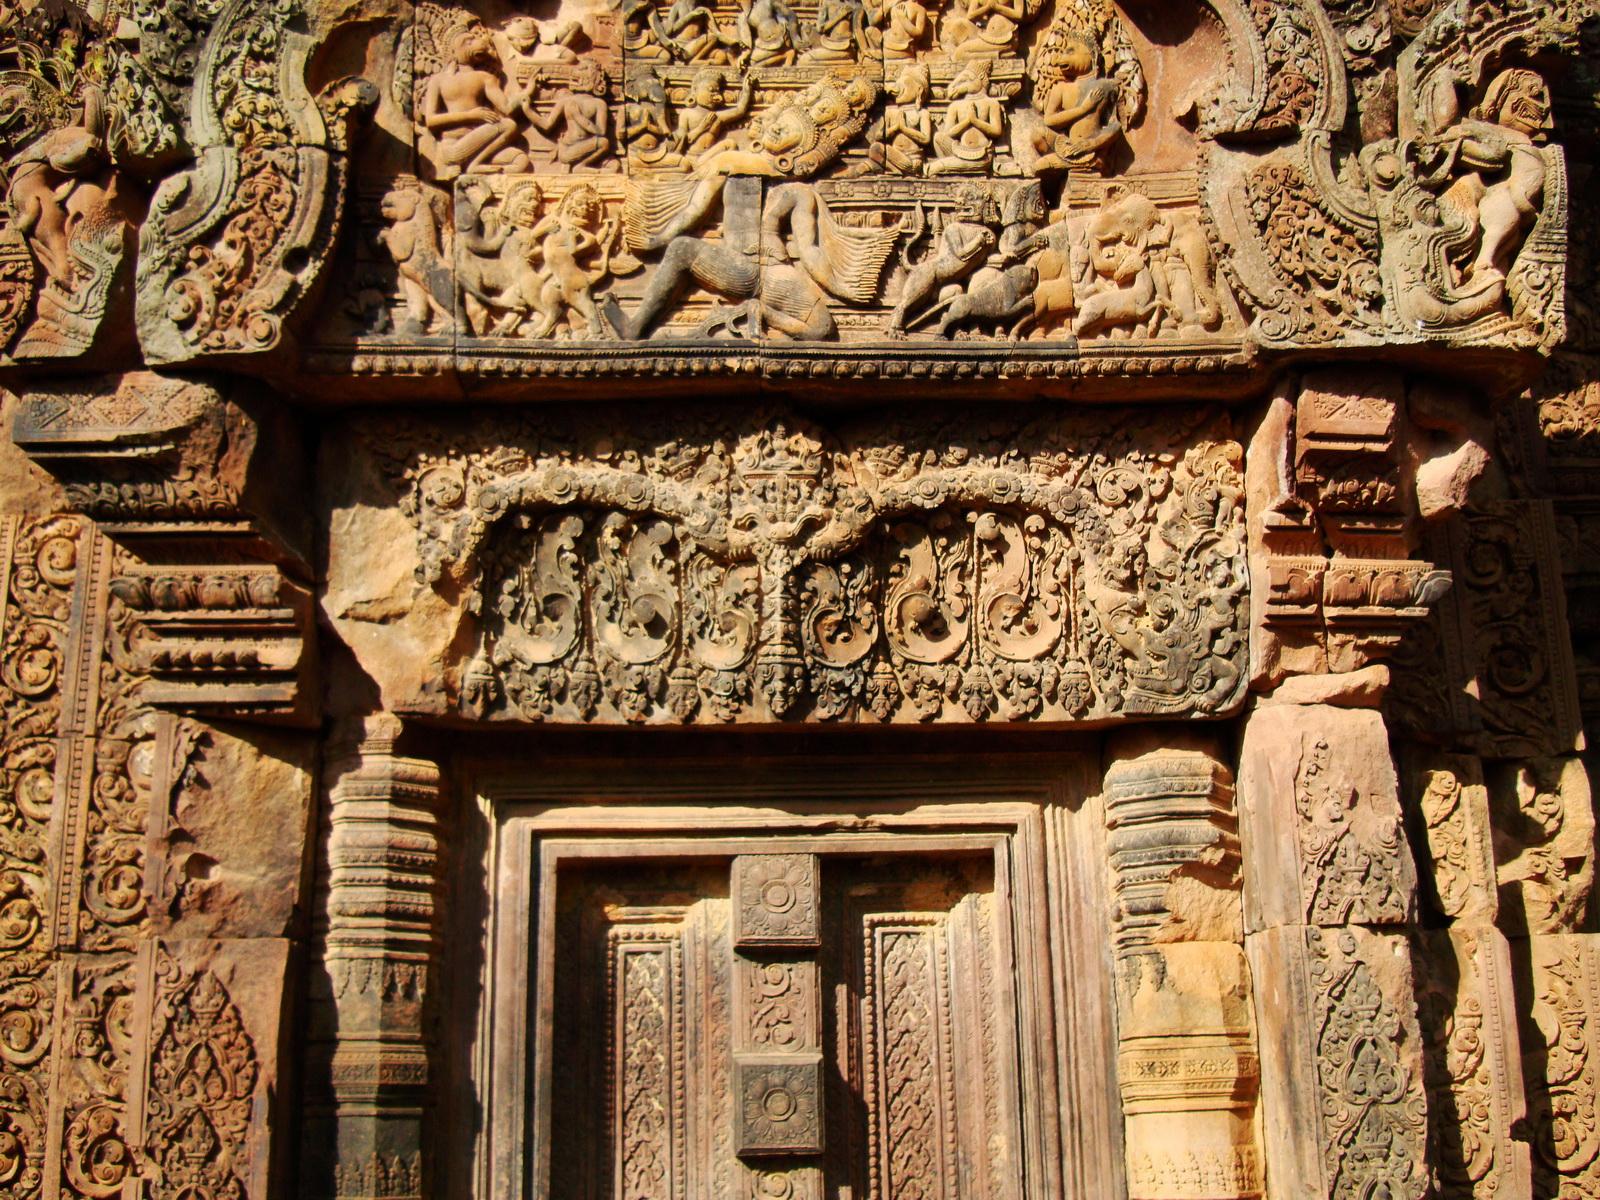 Banteay Srei red sandstone pediment shows Ravana shaking Mount Kailasa 03